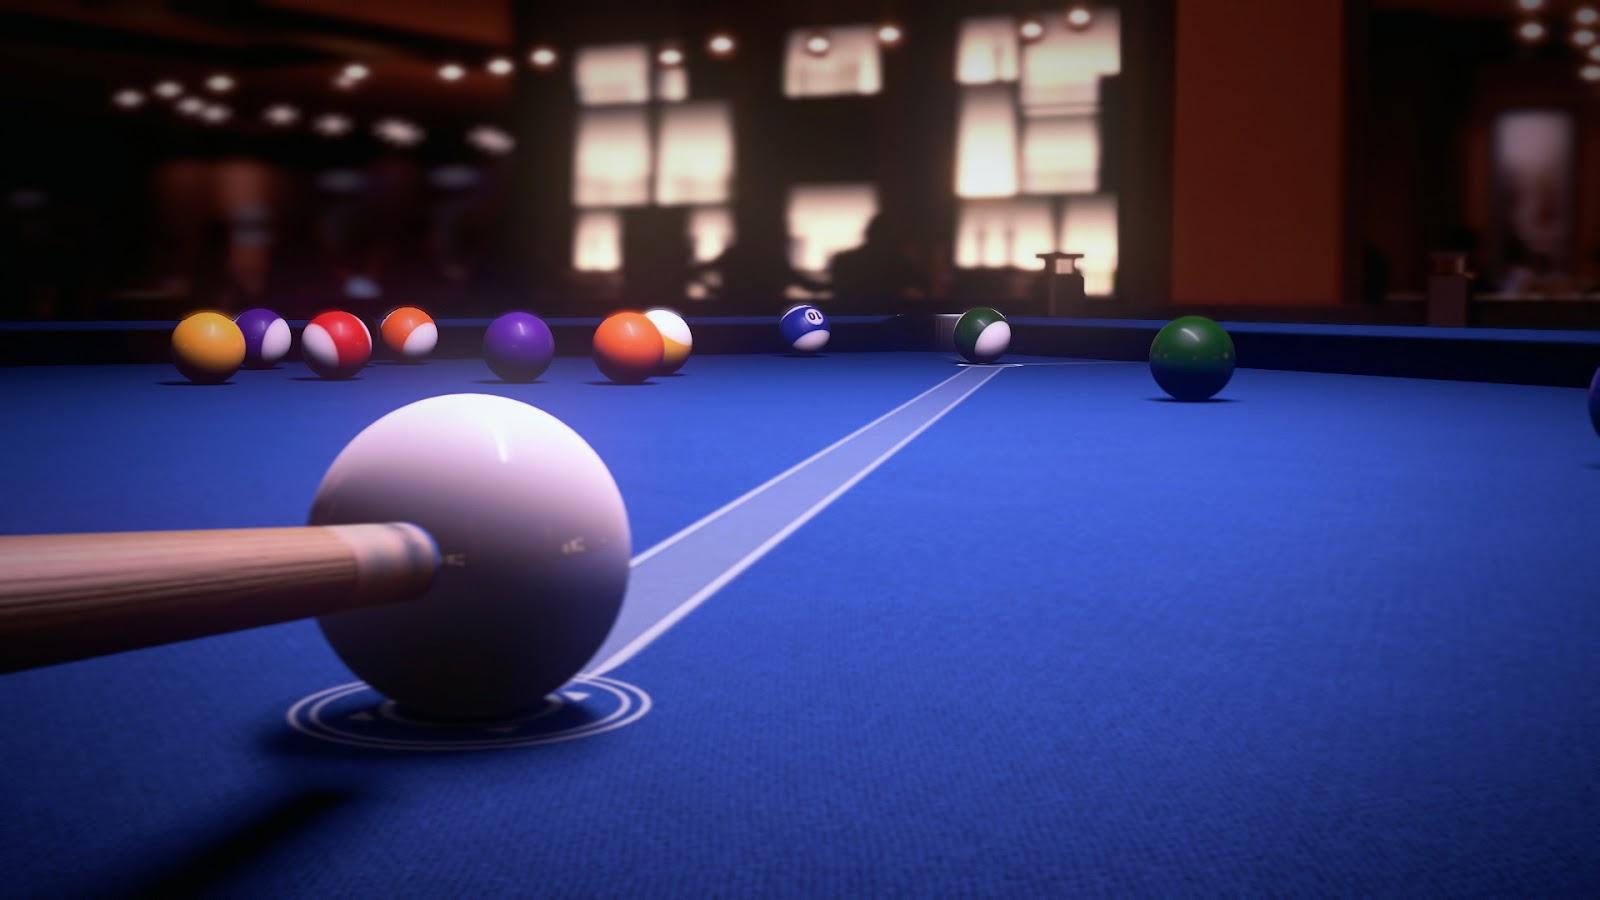 Pool Video Game Reviews